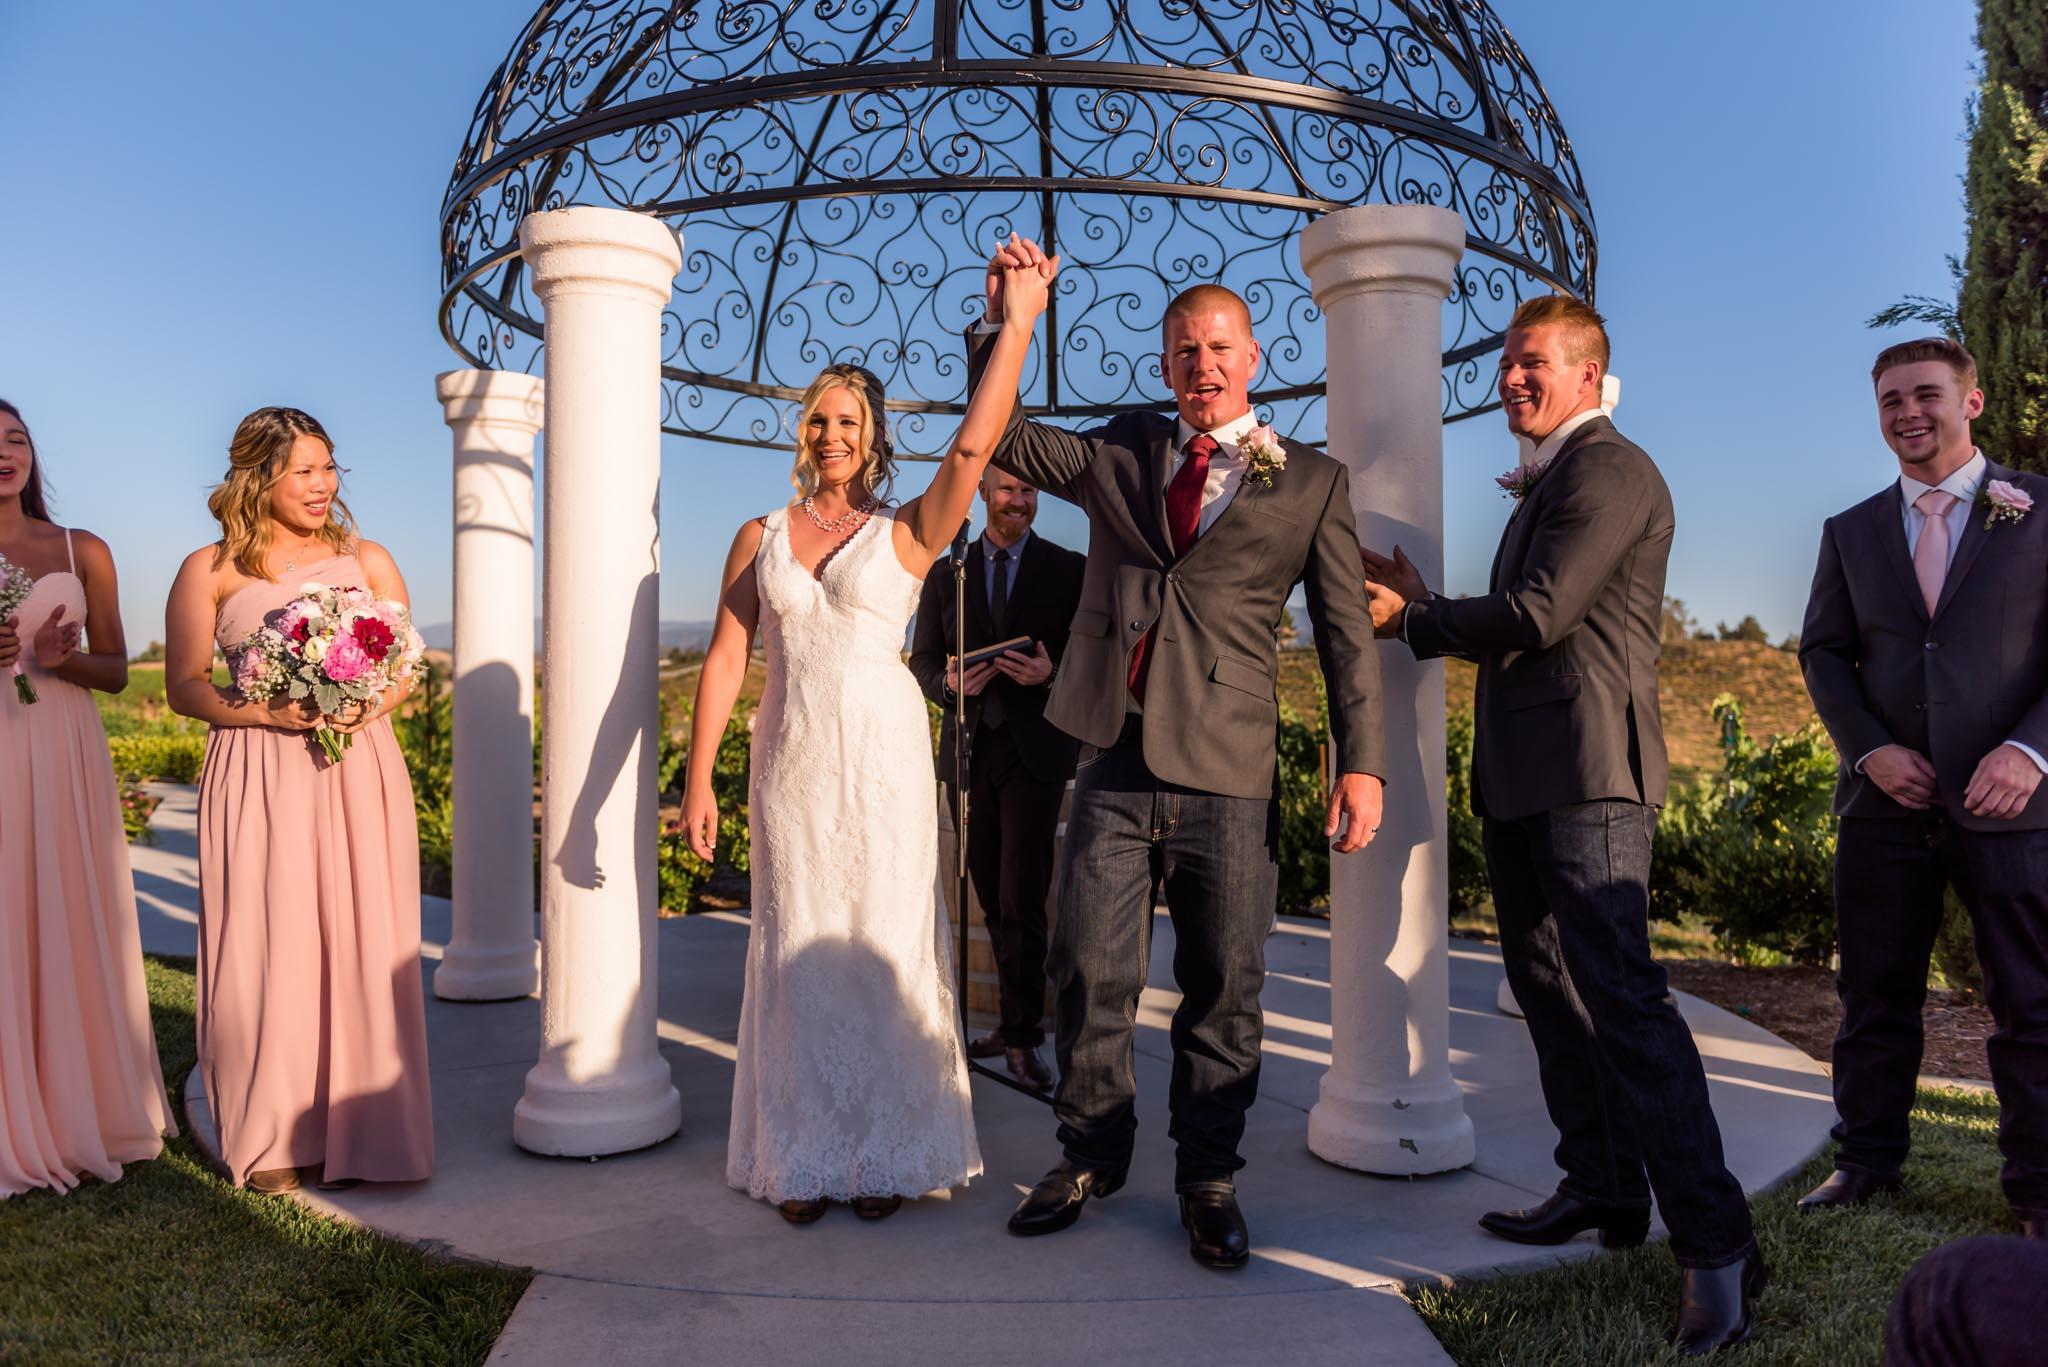 Avensole-Winery-Temecula-Wedding-Josh-and-Olivia-3631.JPG